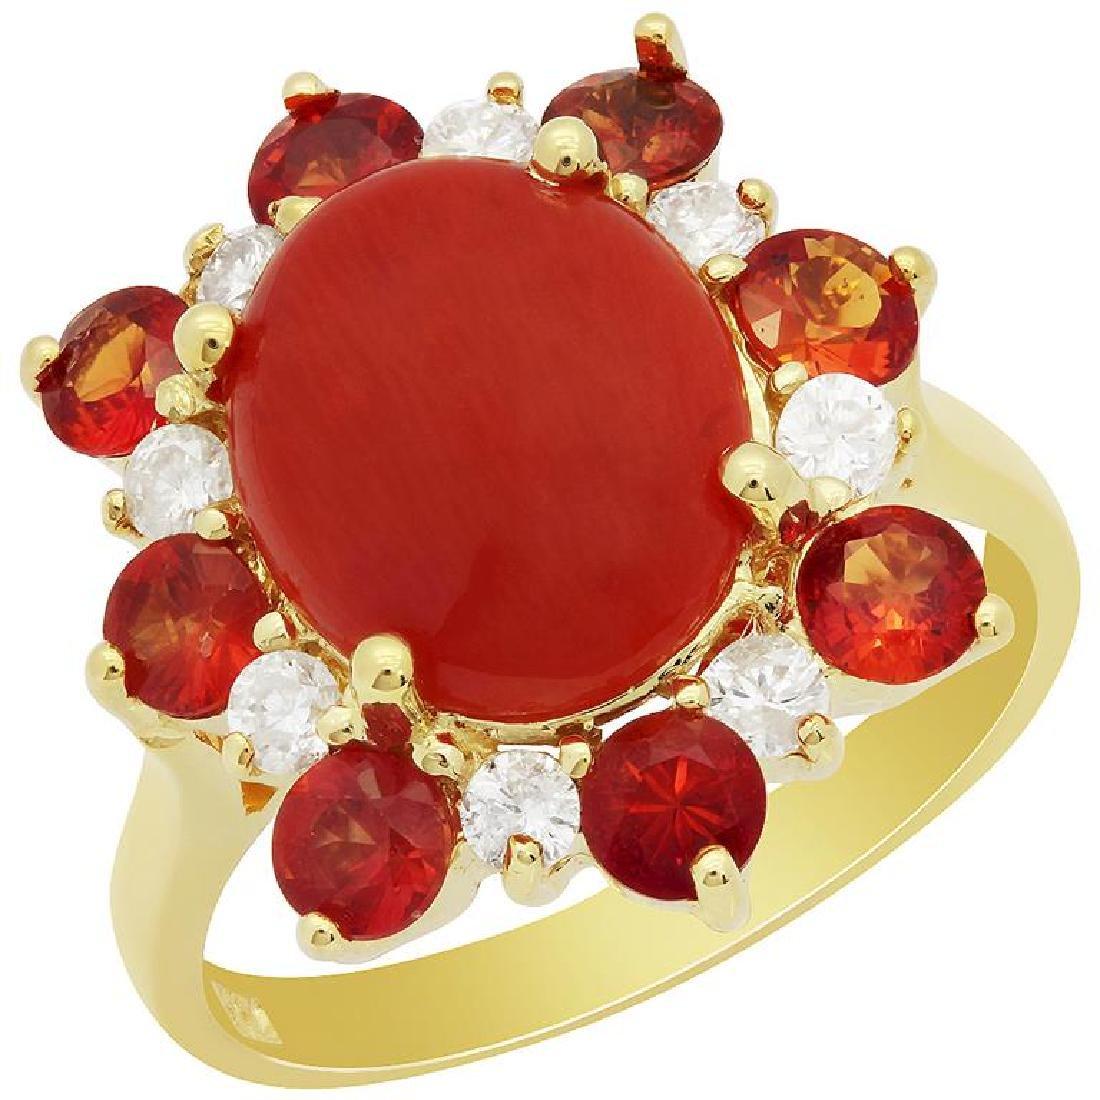 14k Yellow Gold 2.15ct Coral 1.42ct Orange Sapphire